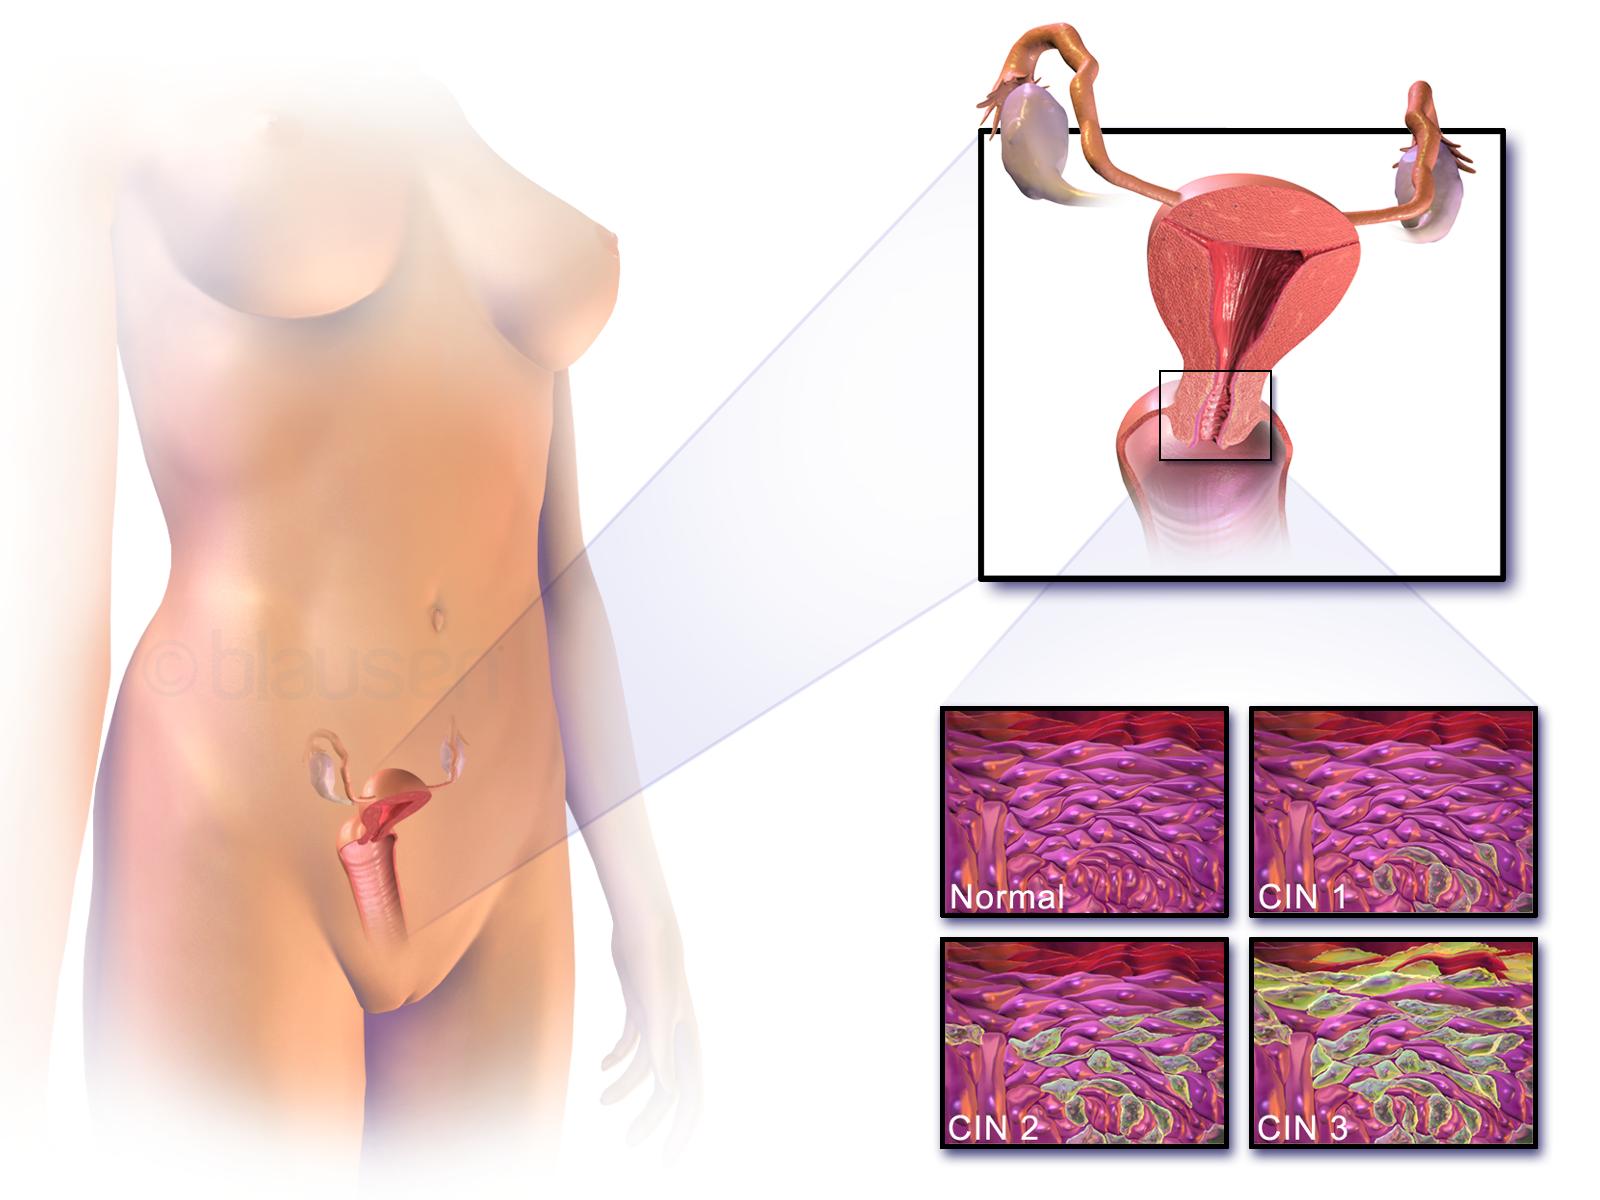 hpv cancer symptoms)